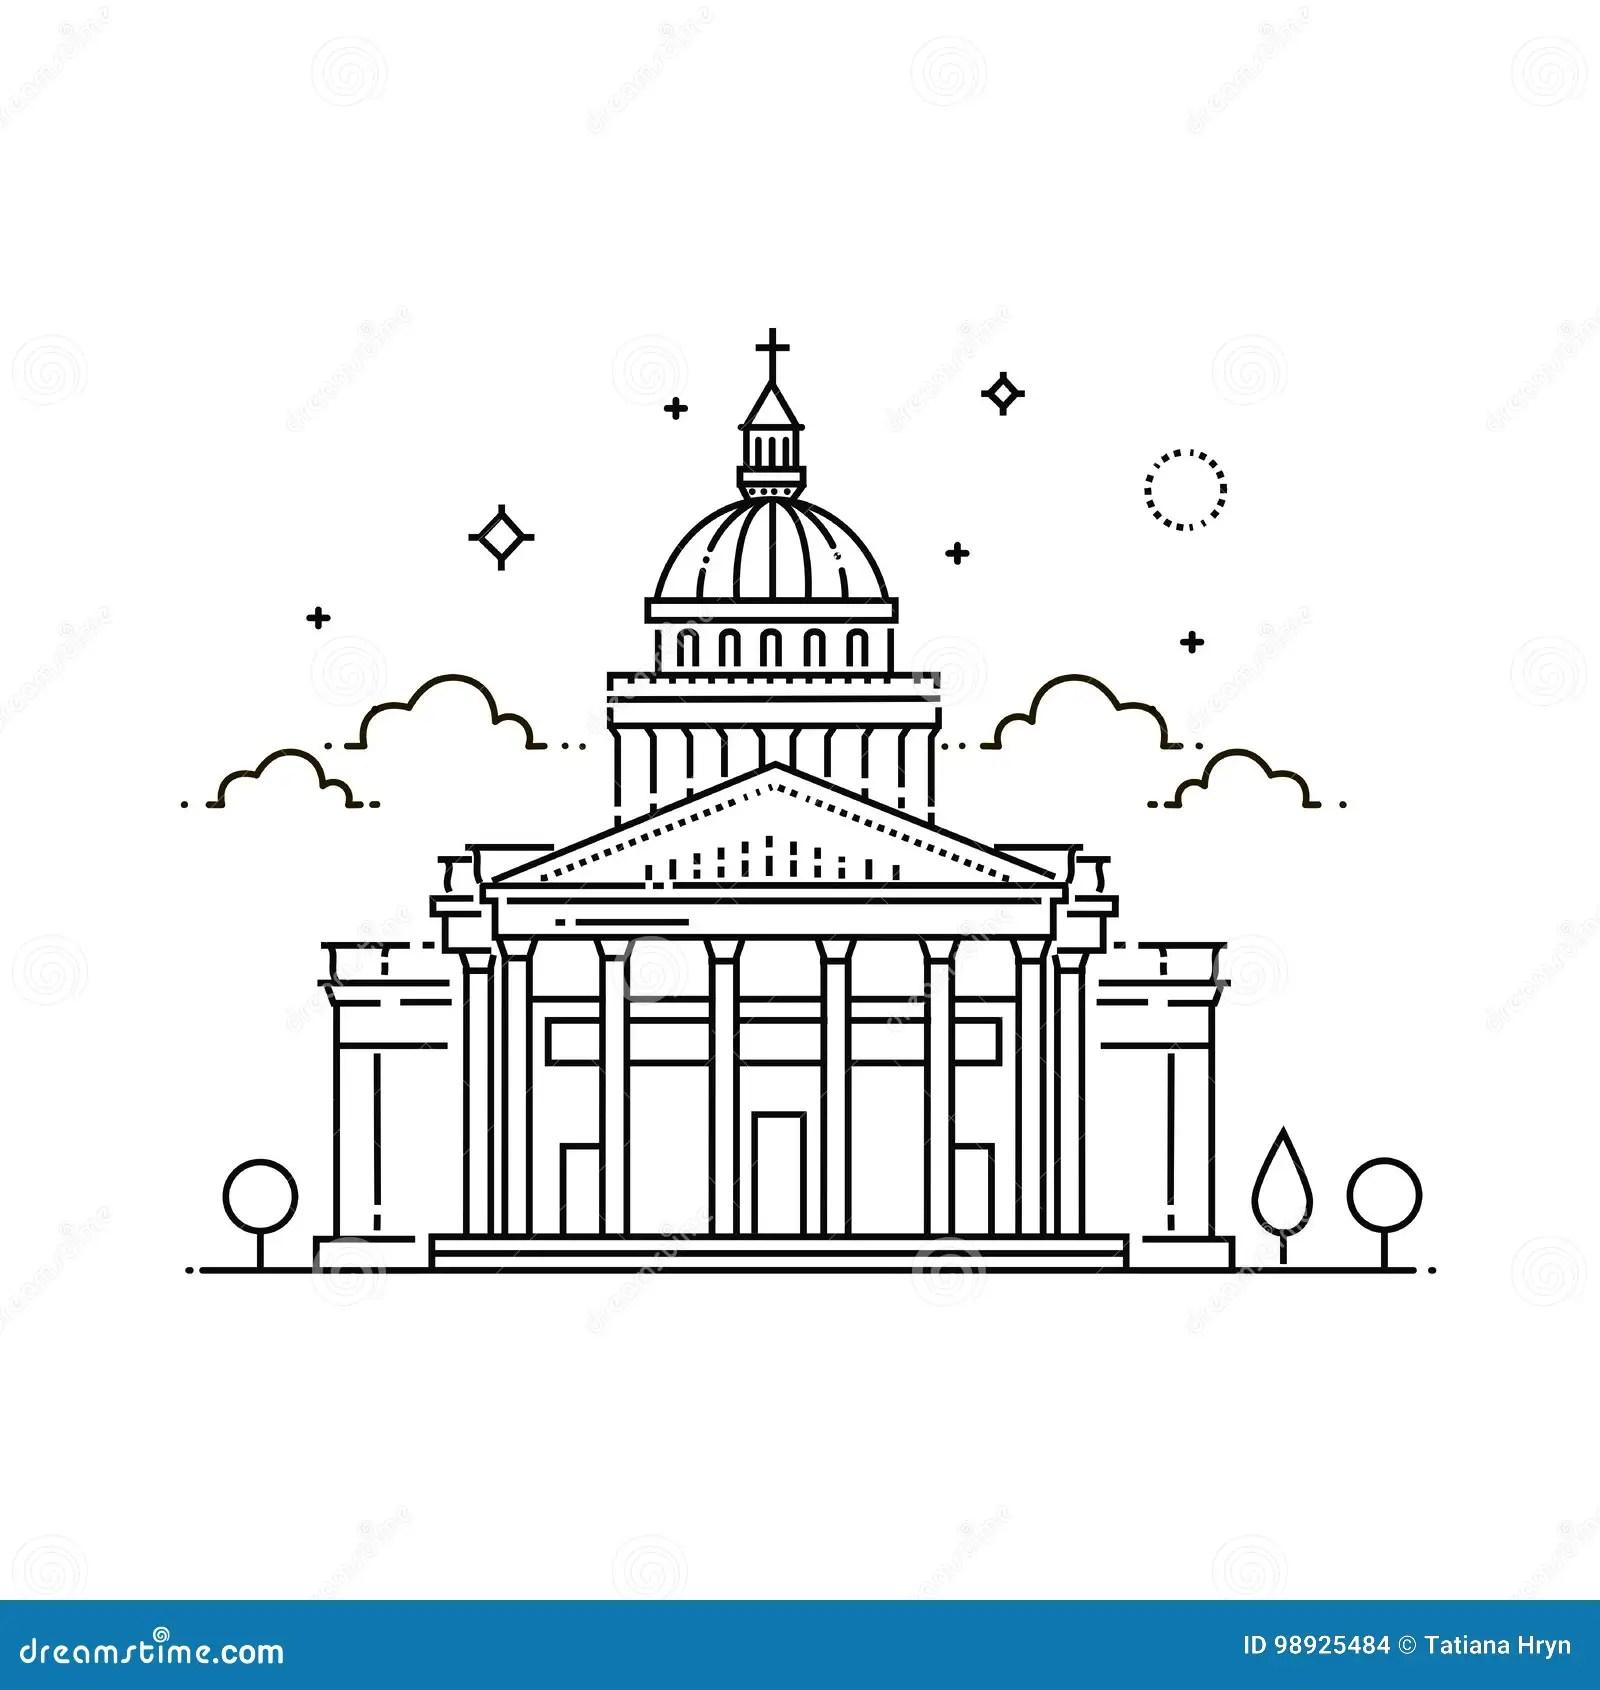 Franca Paris Panteao Ilustracao Do Curso Do Vetor